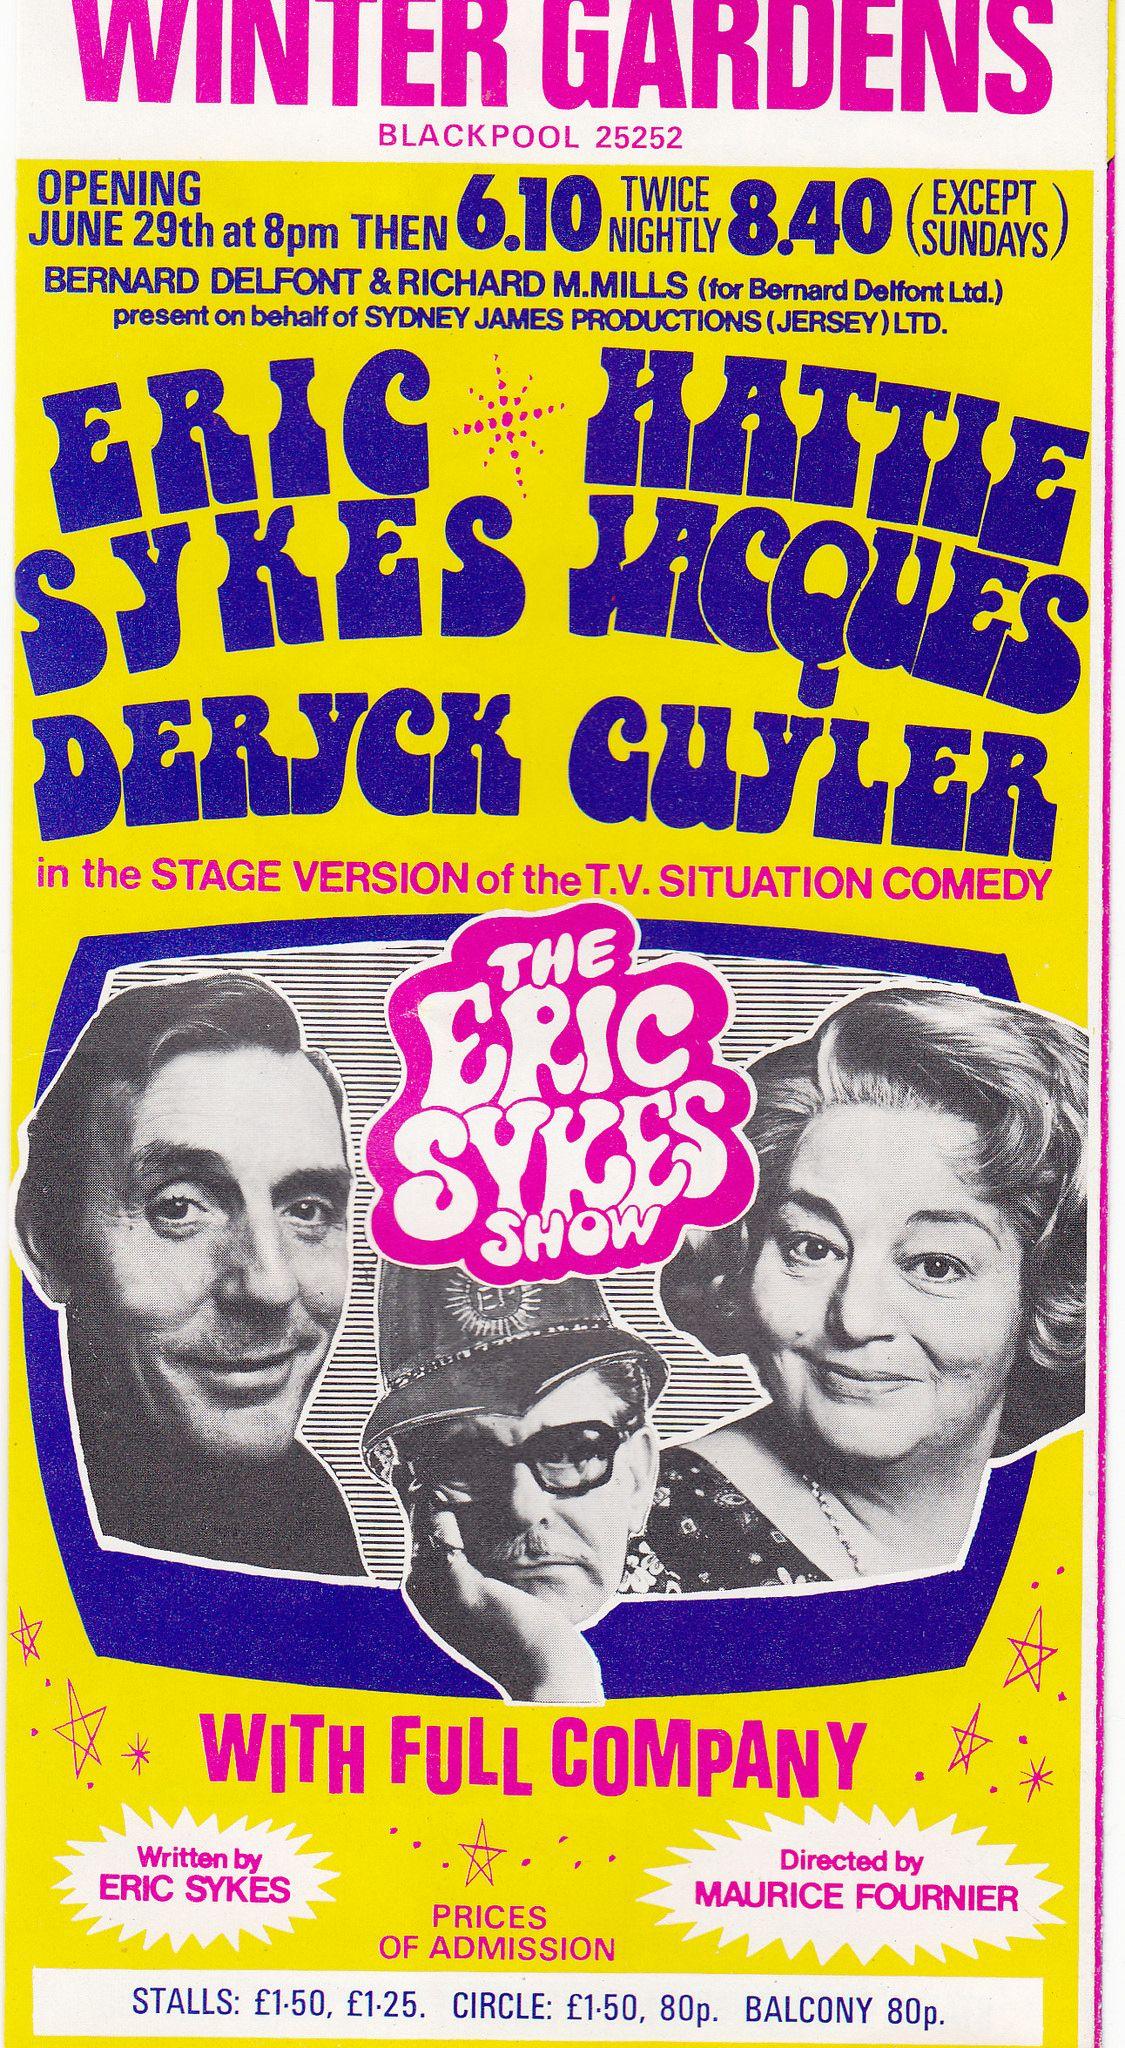 60 u0027s winter gardens theatre blackpool handbill eric sykes